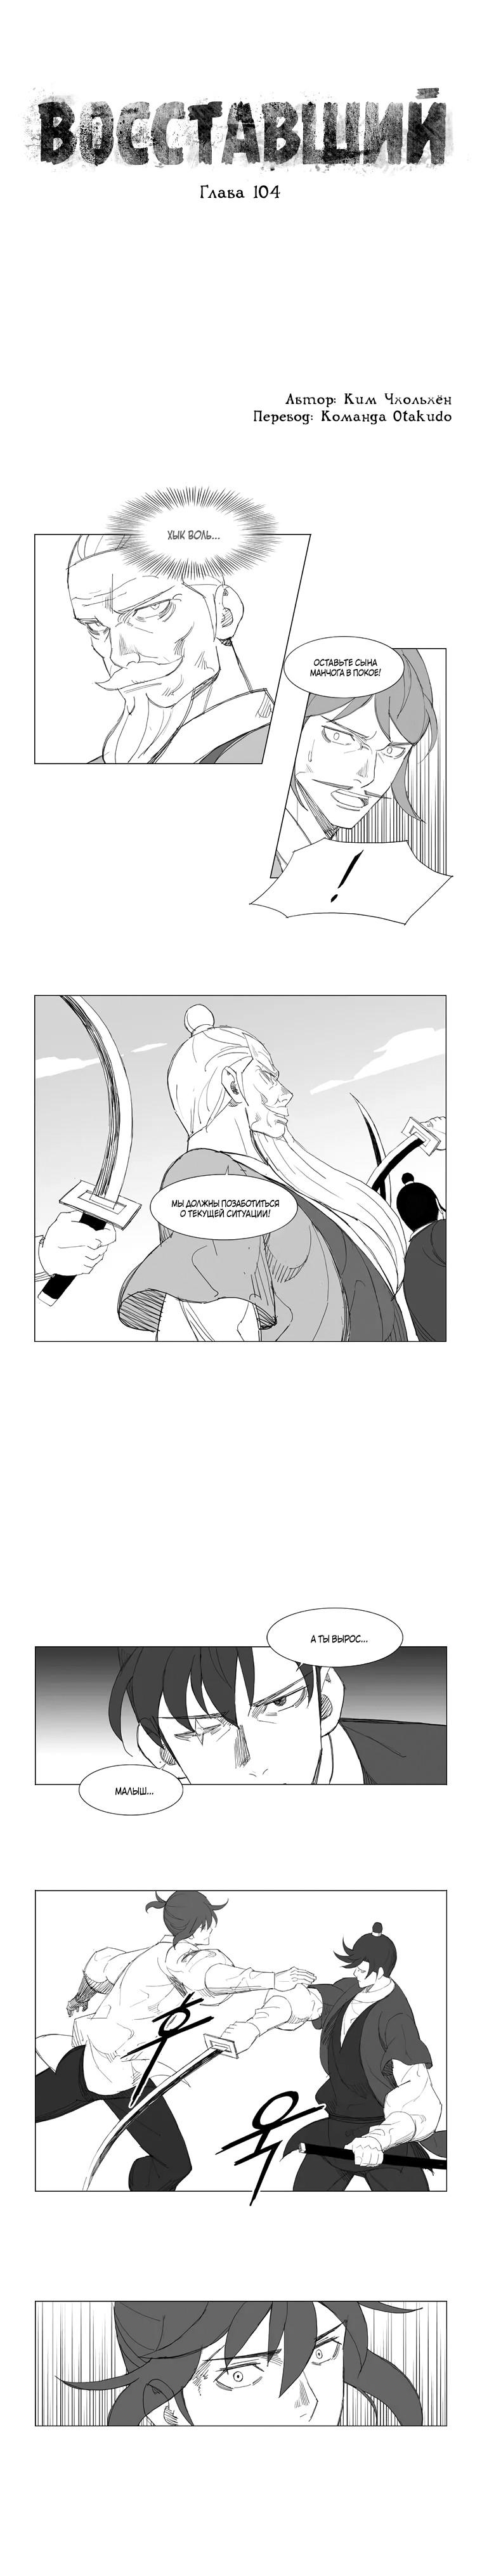 https://r1.ninemanga.com/comics/pic2/39/28263/411783/1524013579231.jpg Page 1